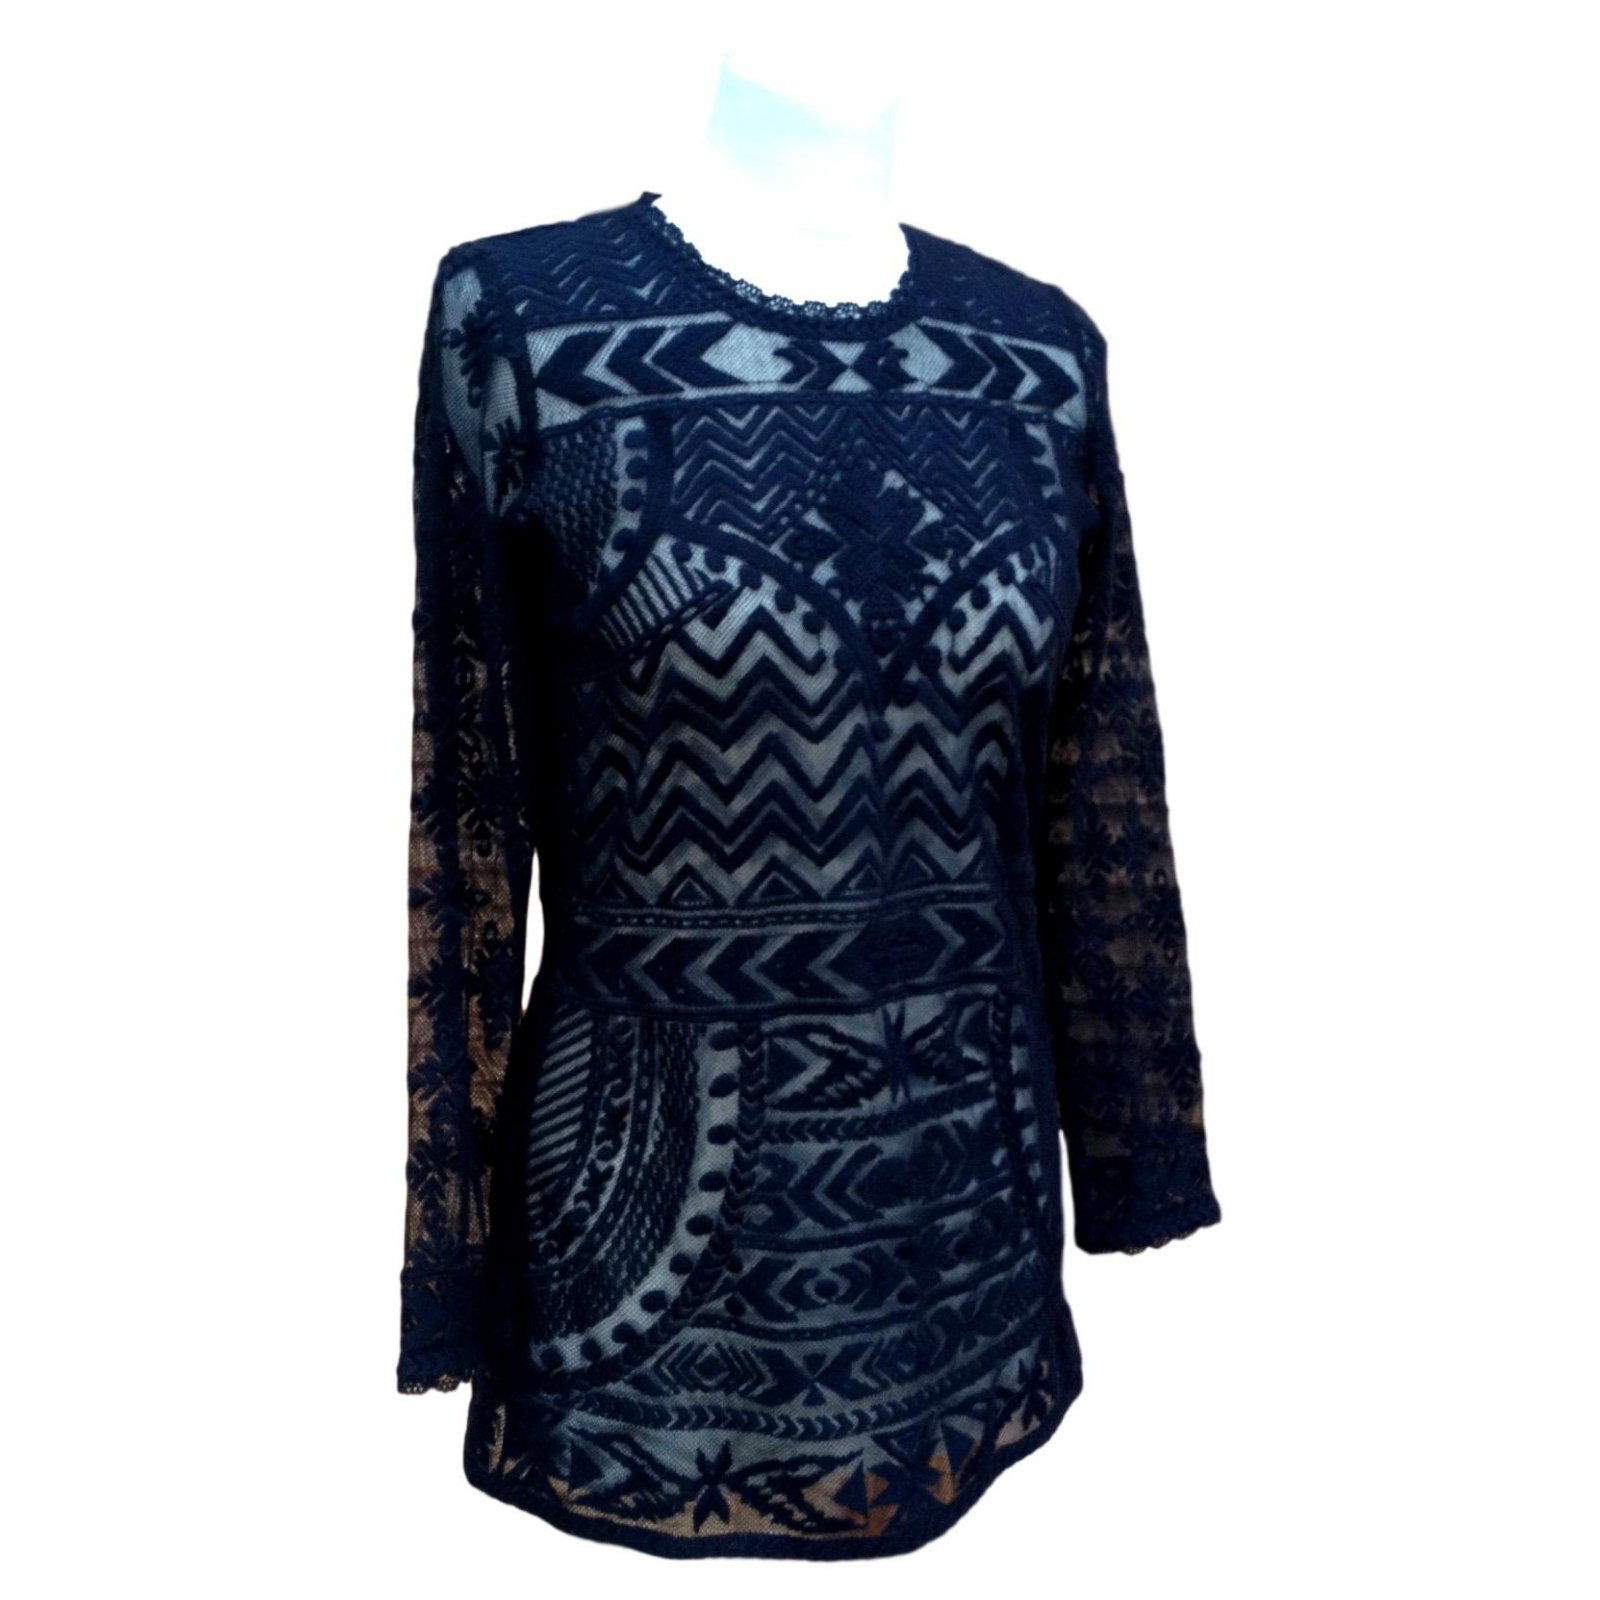 ecbb33237d4be8 Isabel Marant Pour H&M Tops Tops Cotton Black ref.106149 - Joli Closet